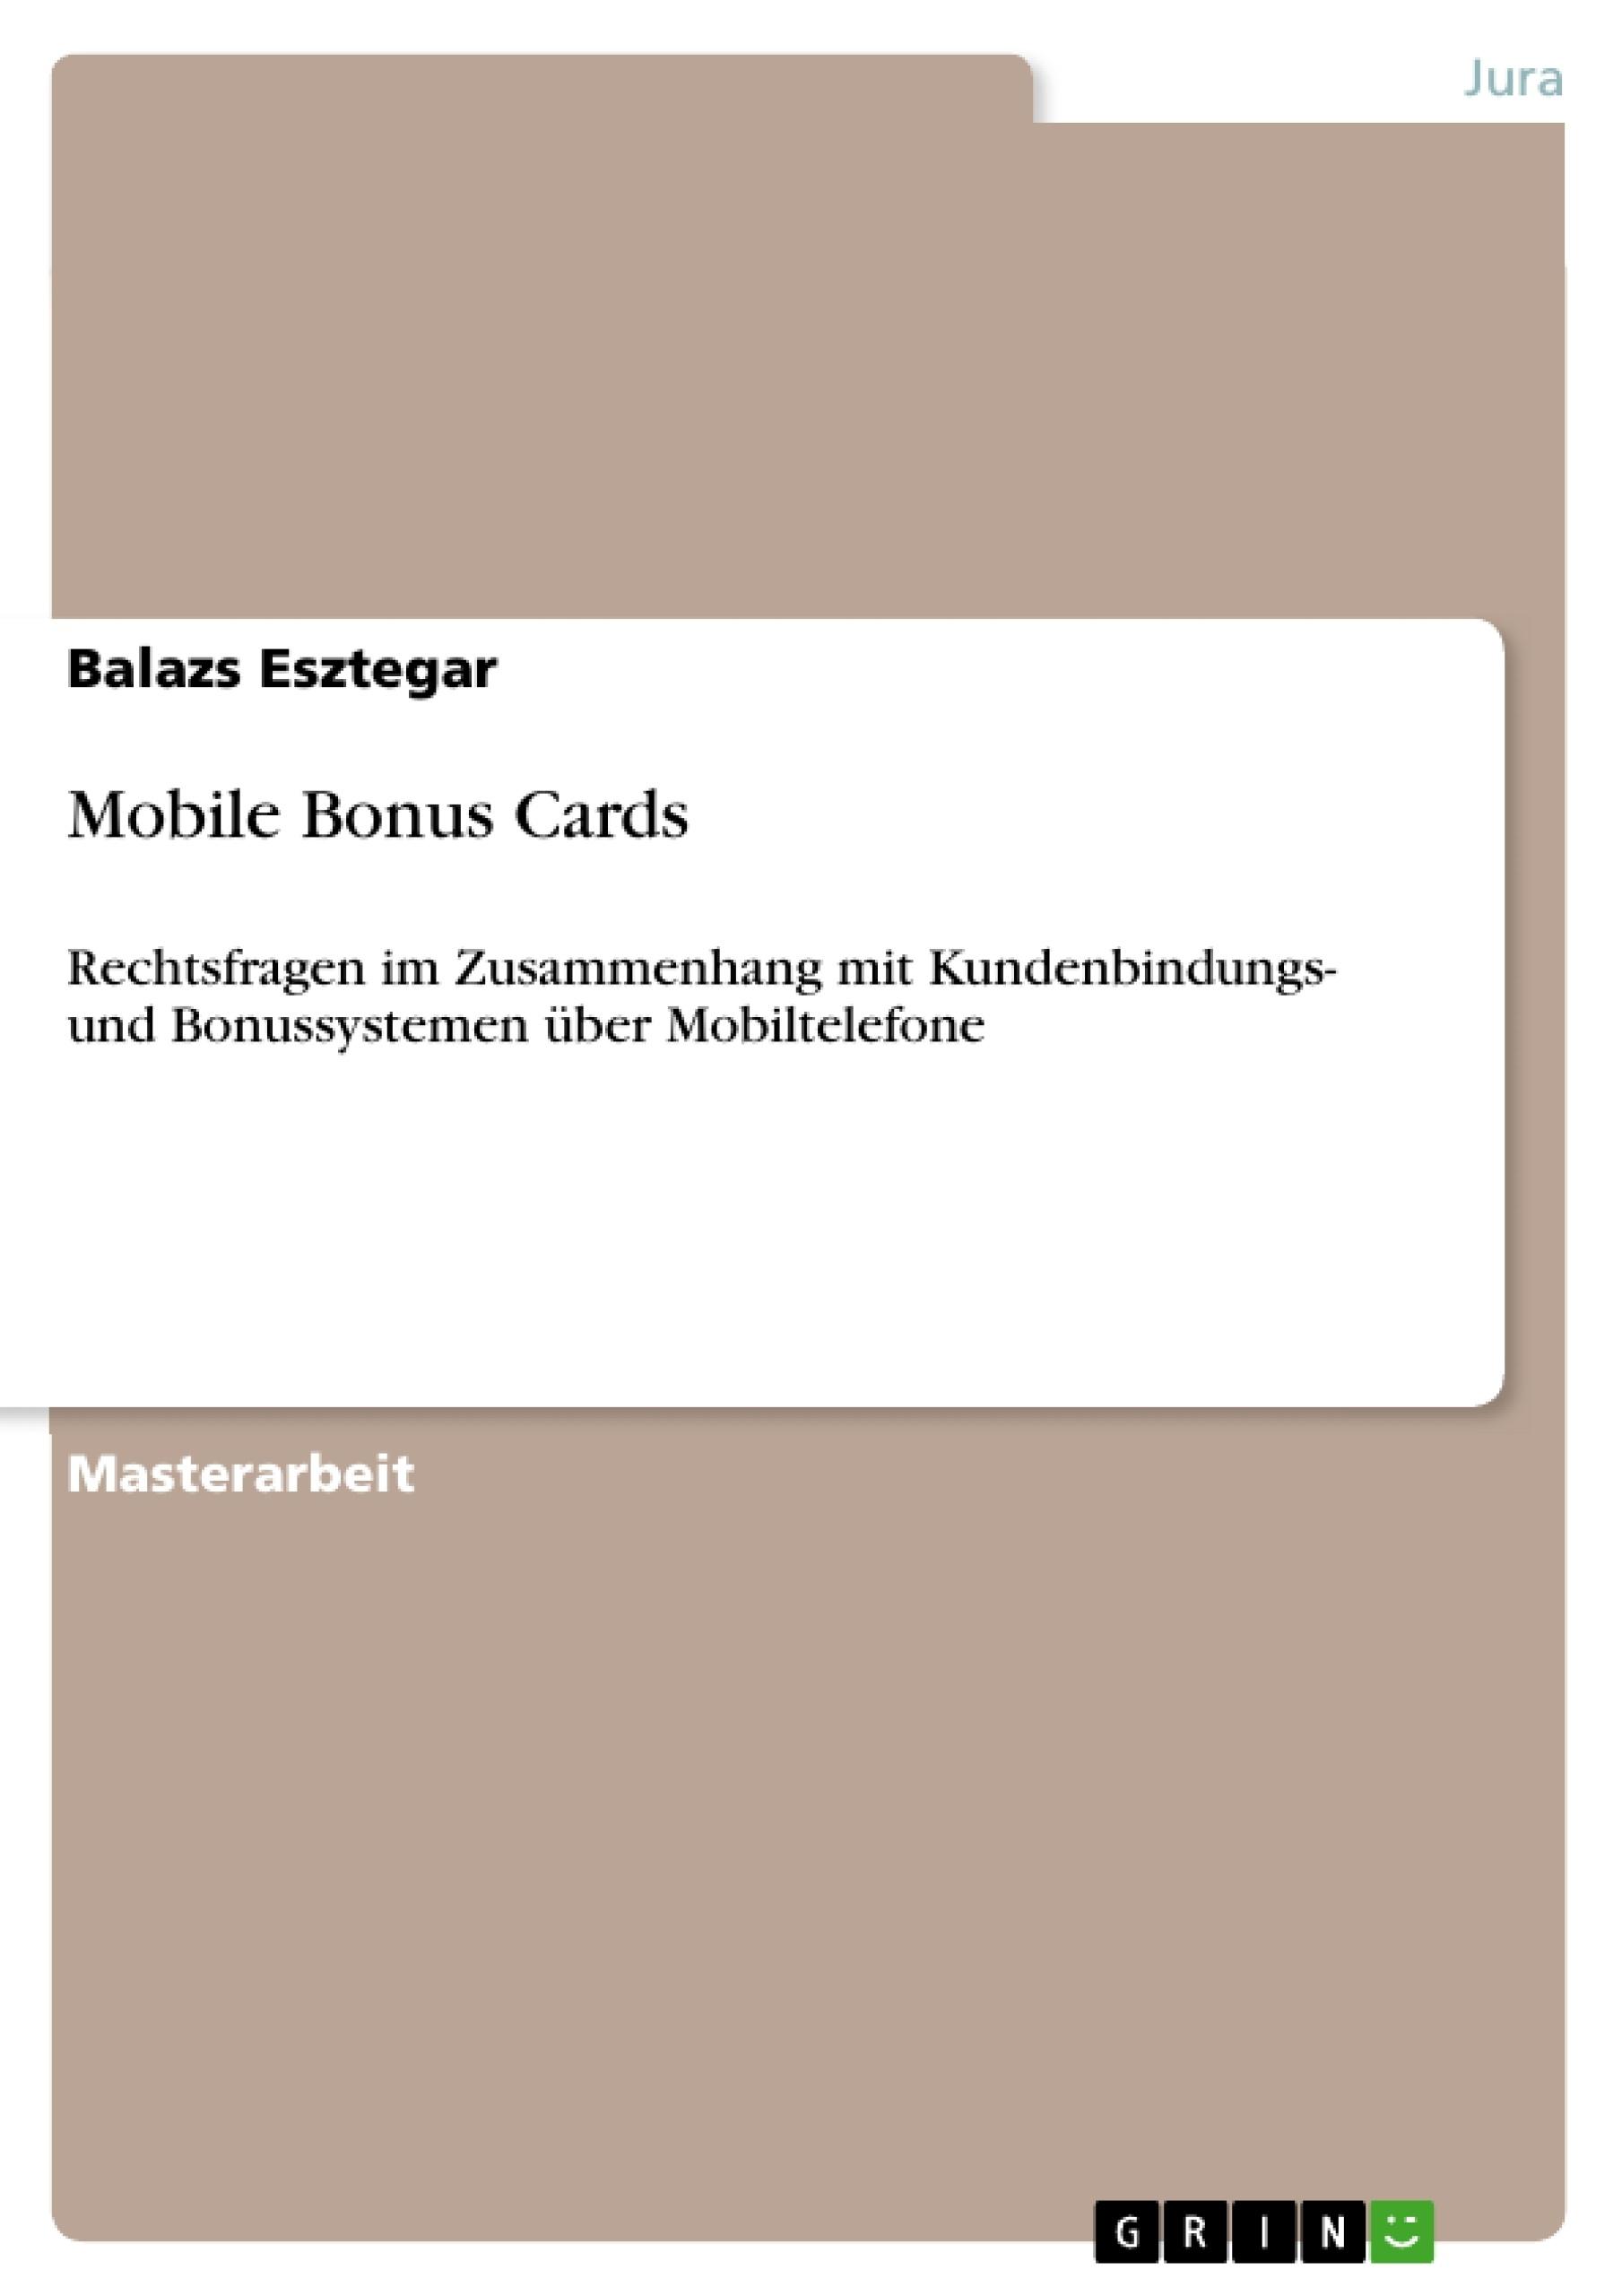 Titel: Mobile Bonus Cards